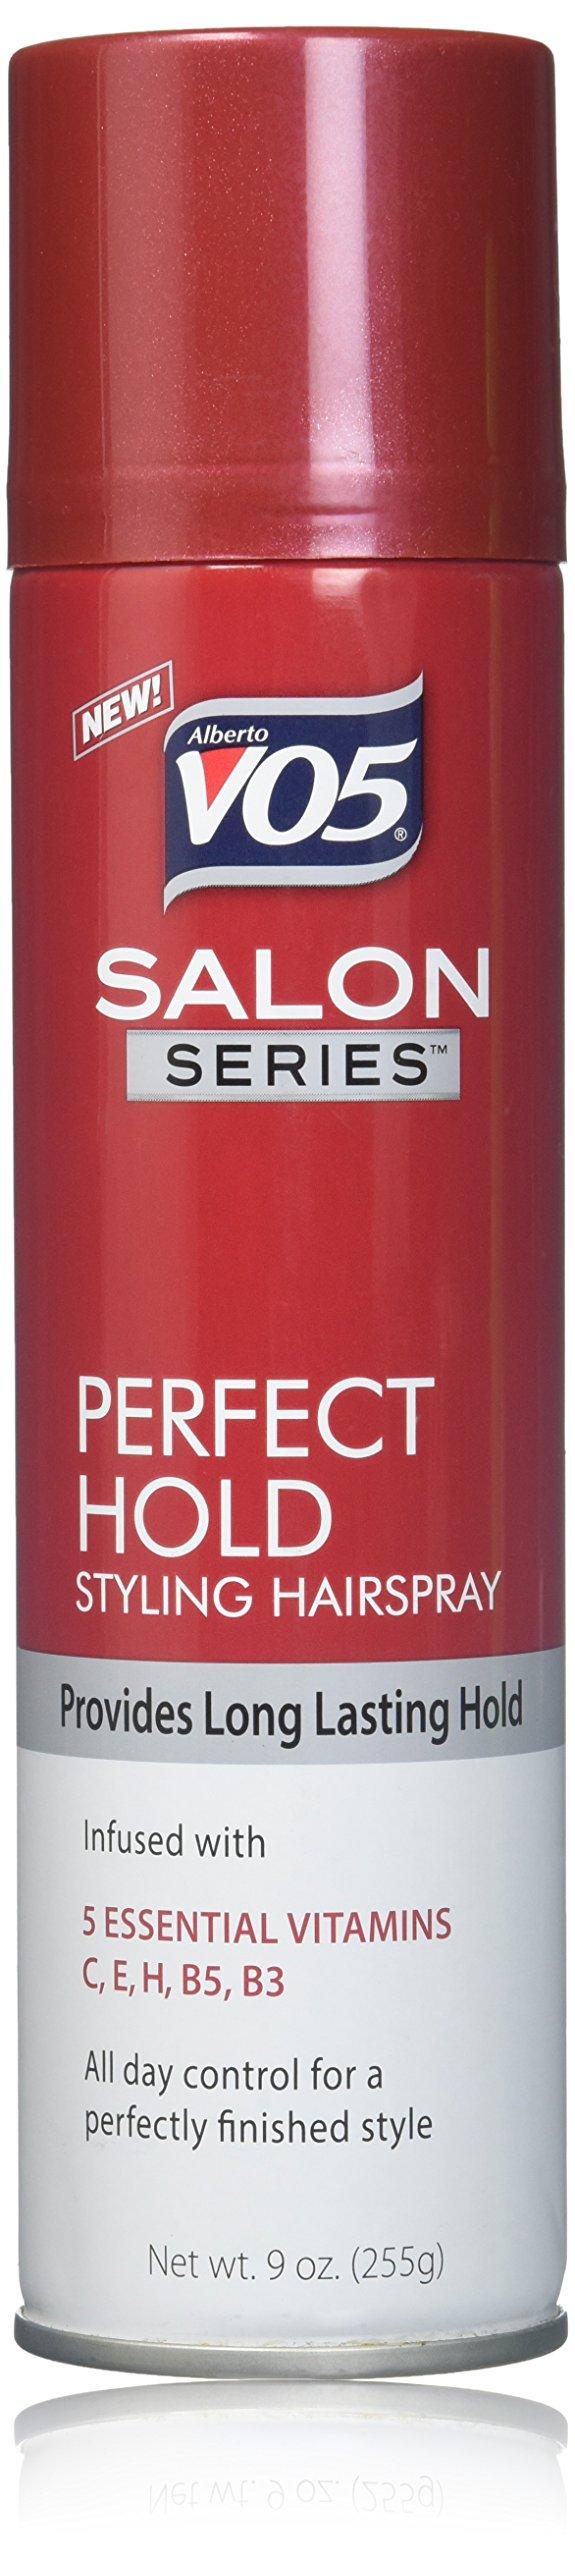 VO5 Salon Series Perfect Hold Aerosol Hair Spray, 9 oz